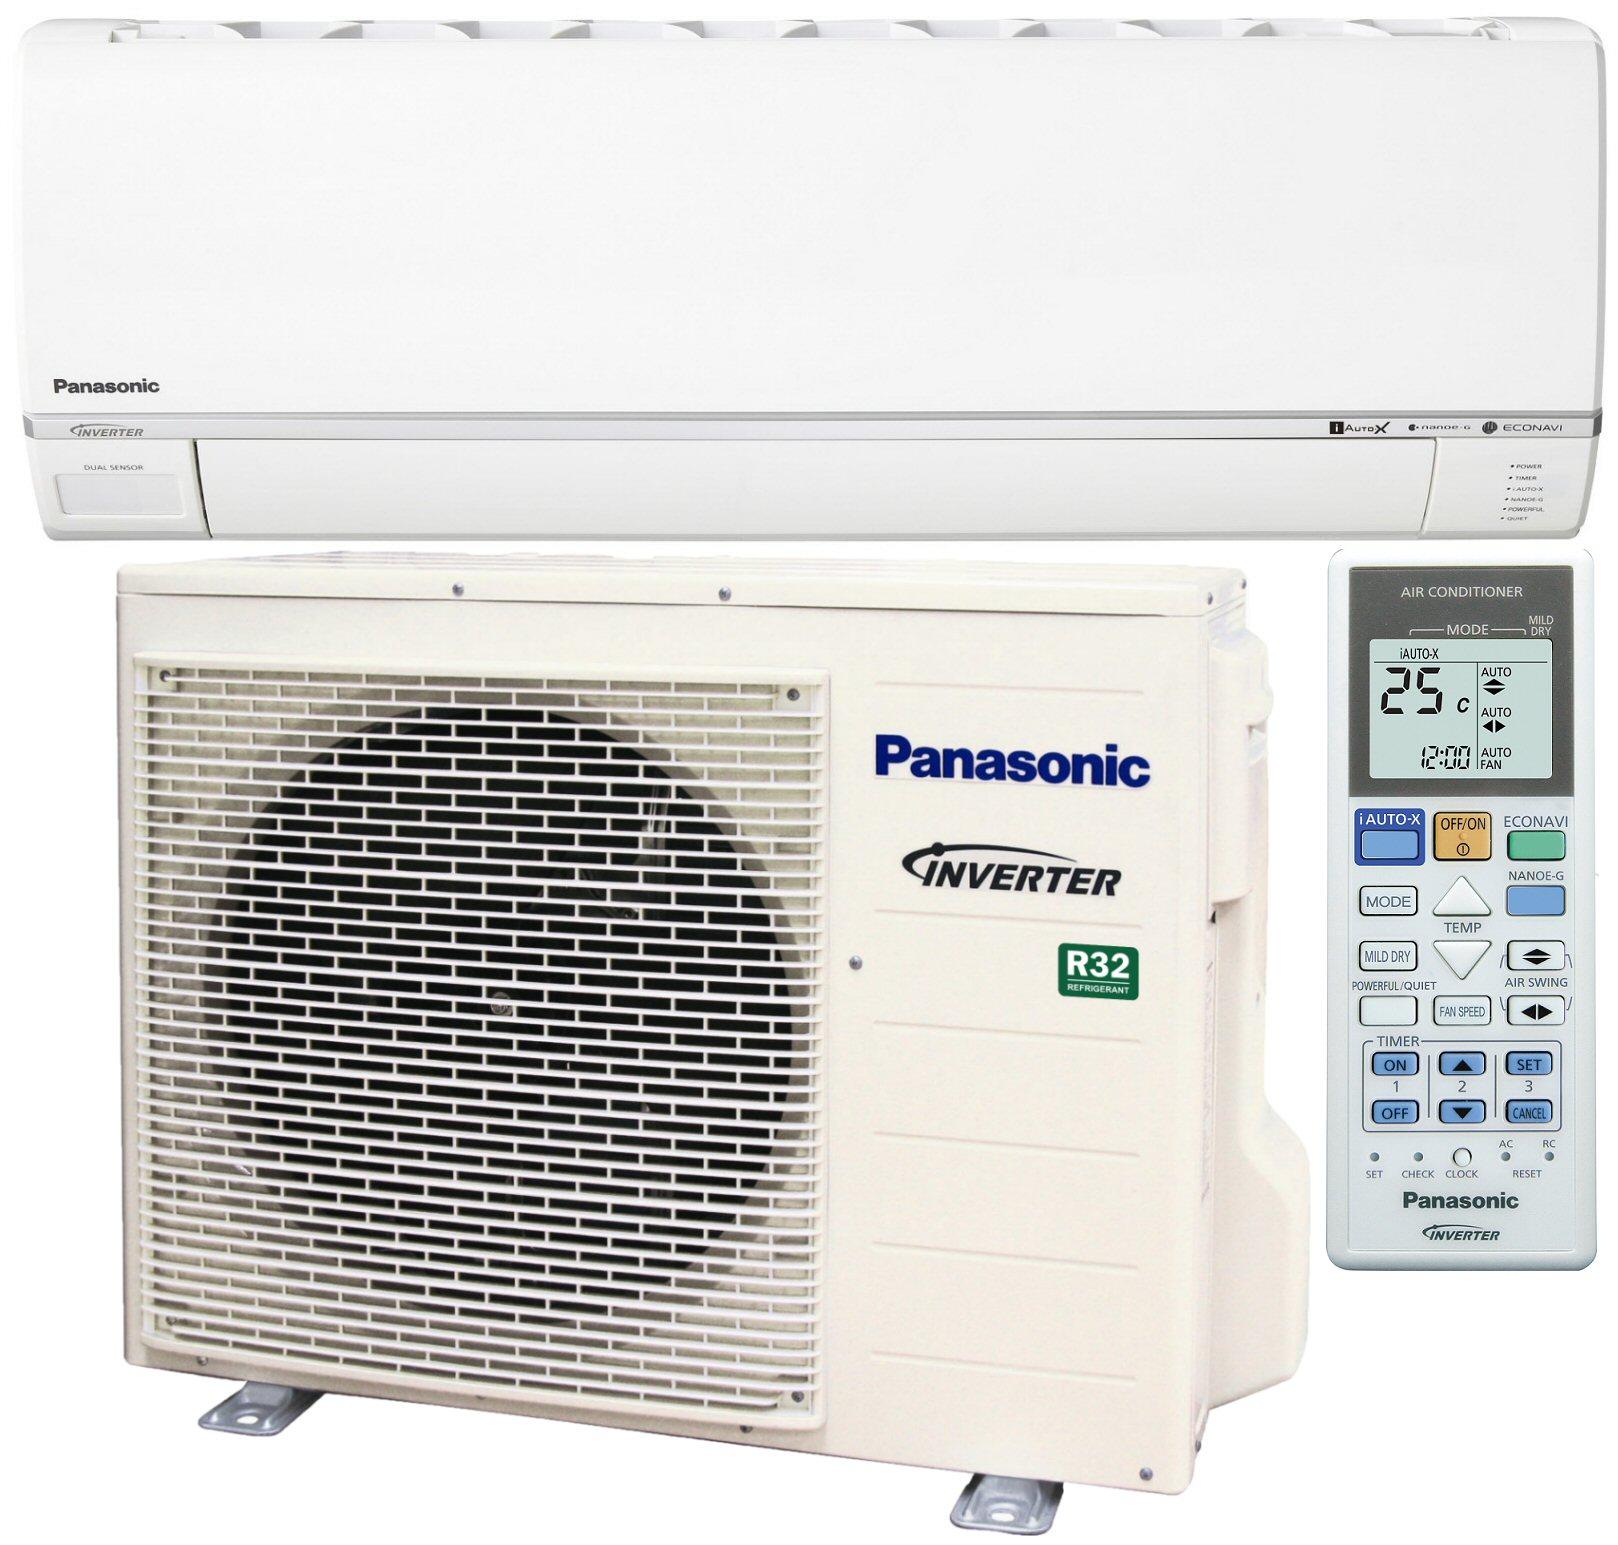 Panasonic Z15RKR.jpg